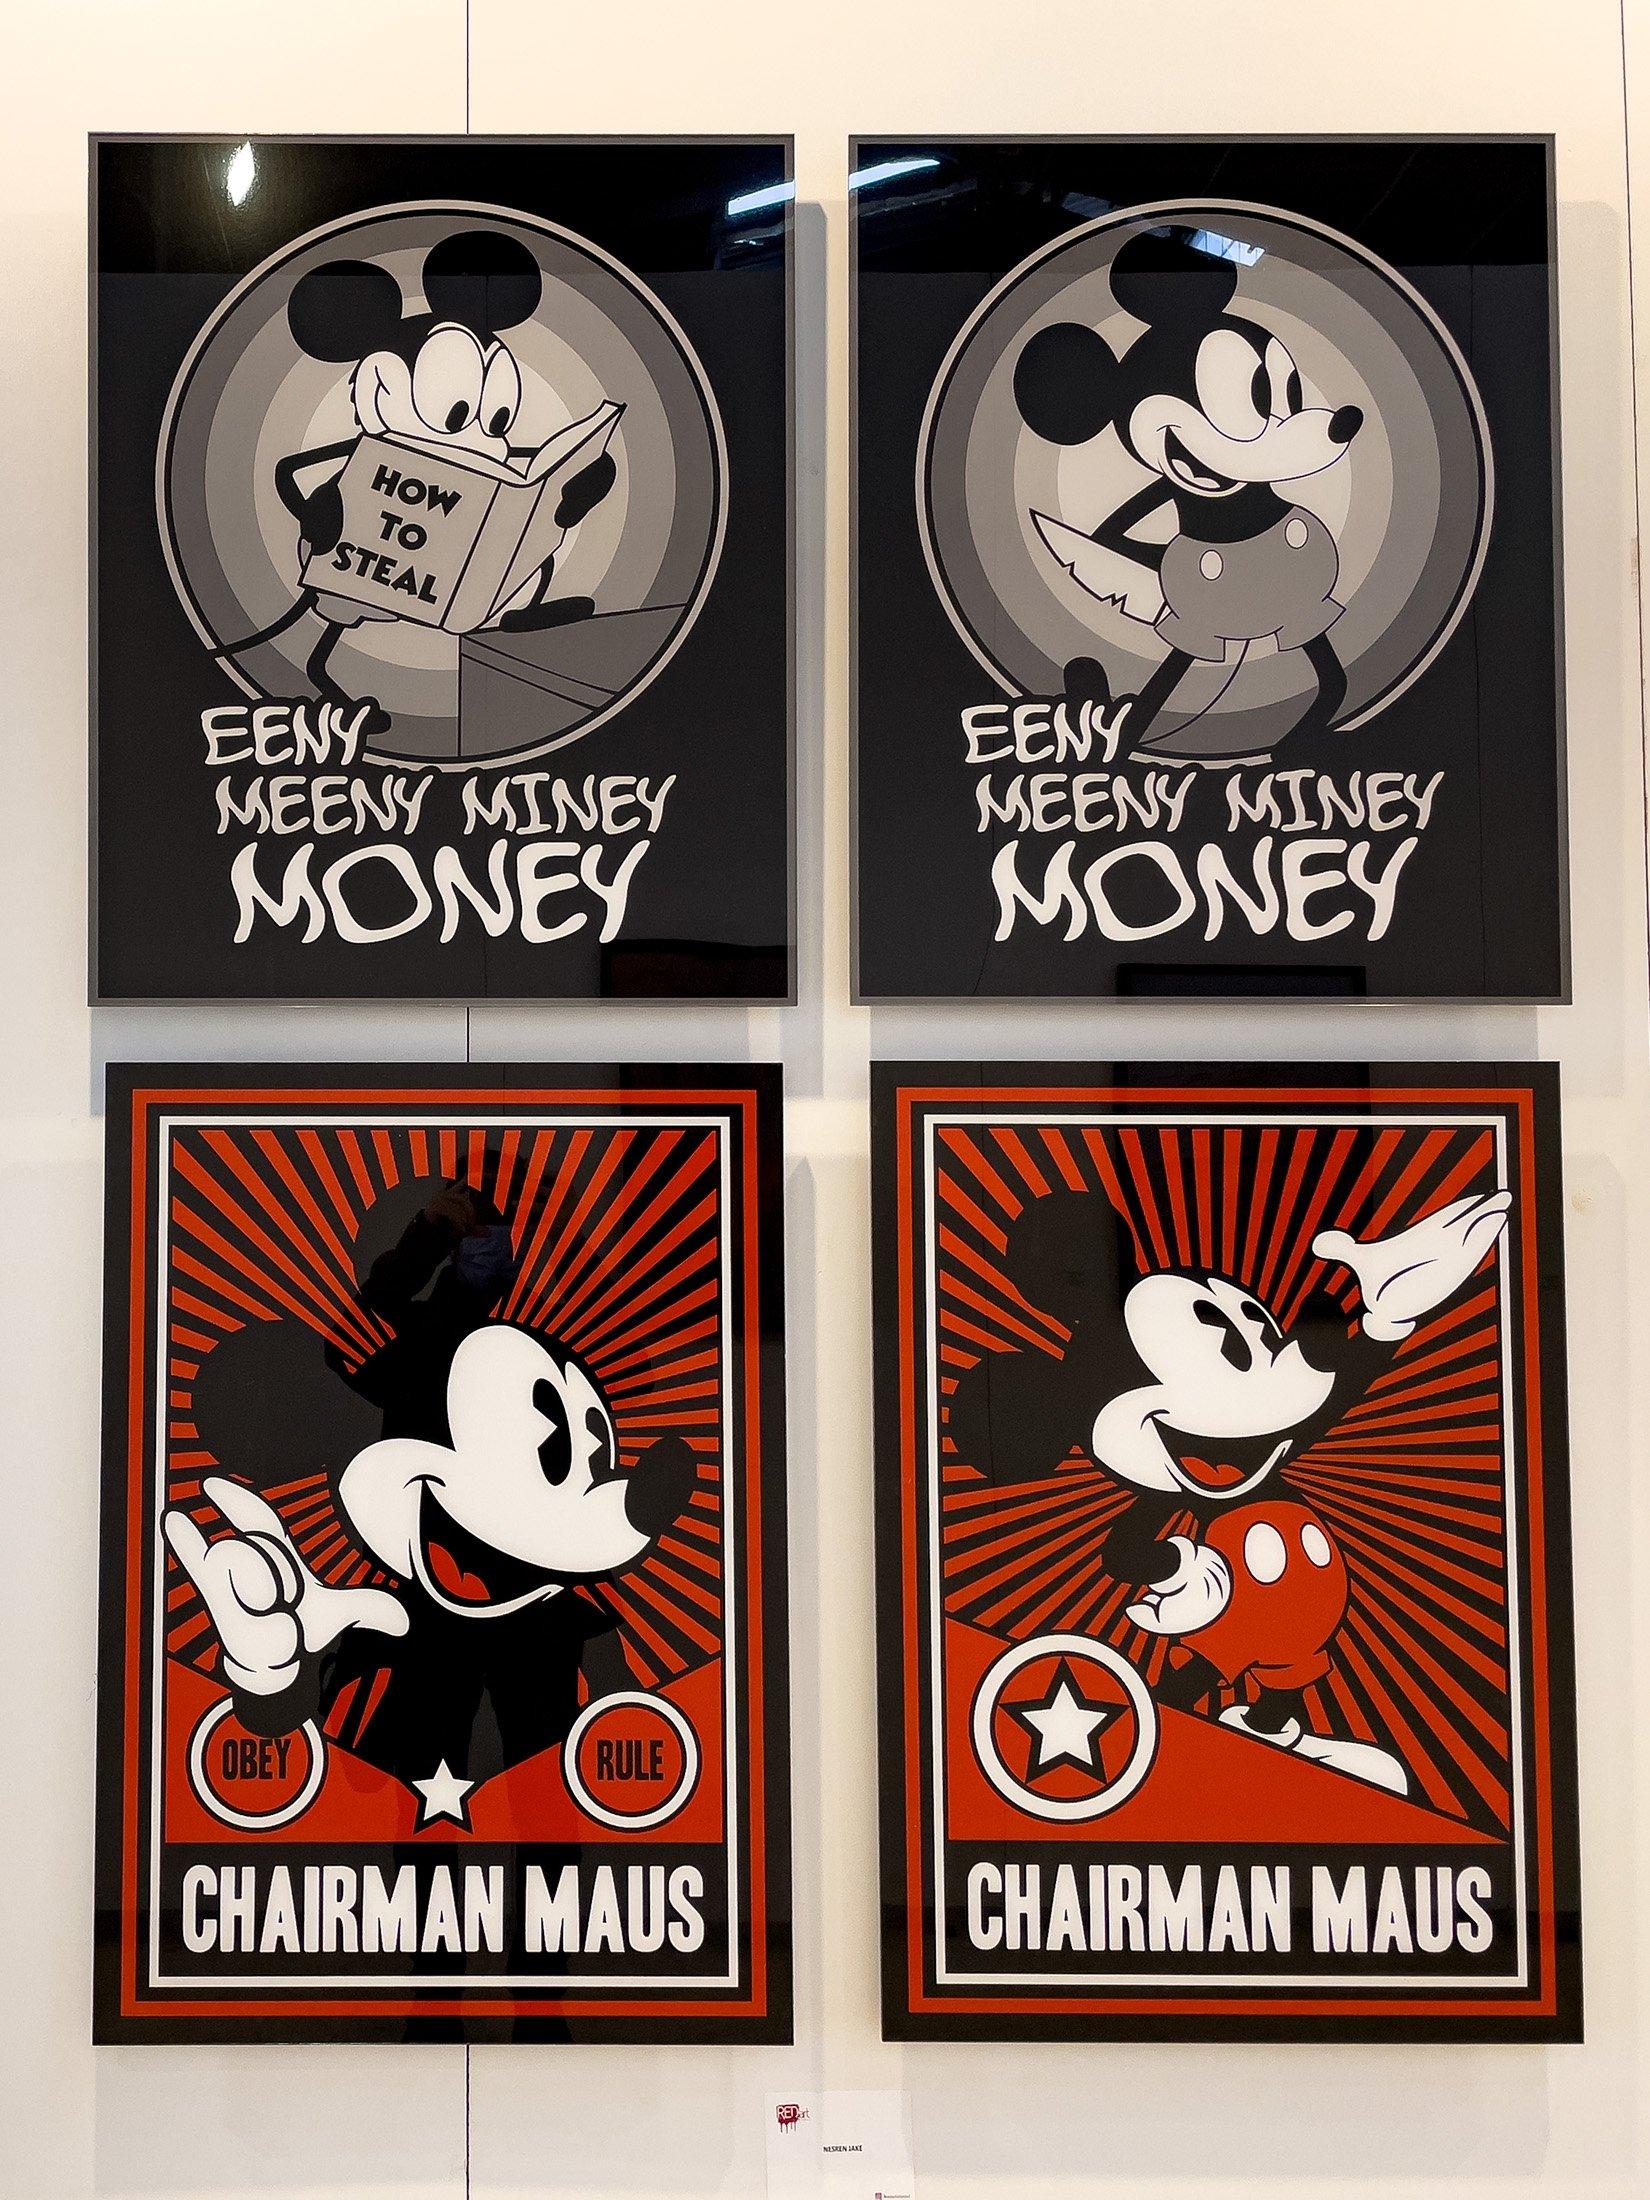 Nesren Jake, 'Easy Money' and 'Chairman Maus' series, dia-sec print, 75 by 60 centimeters. (Photo by Ahmet Koçak)